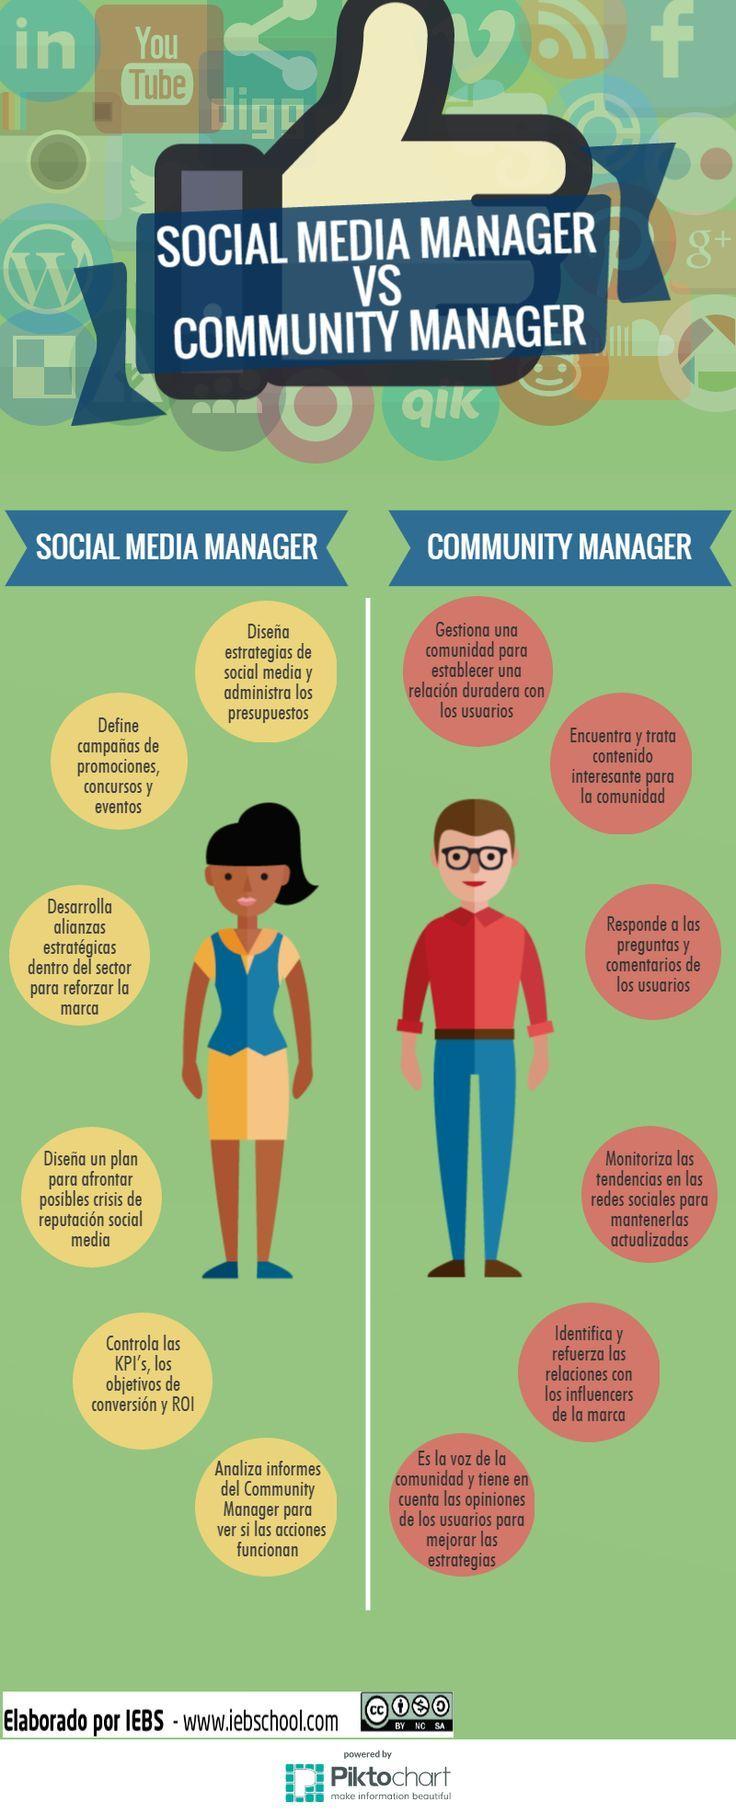 Social Media Manager vs Community Manager #infografia #infographic #socialmedia